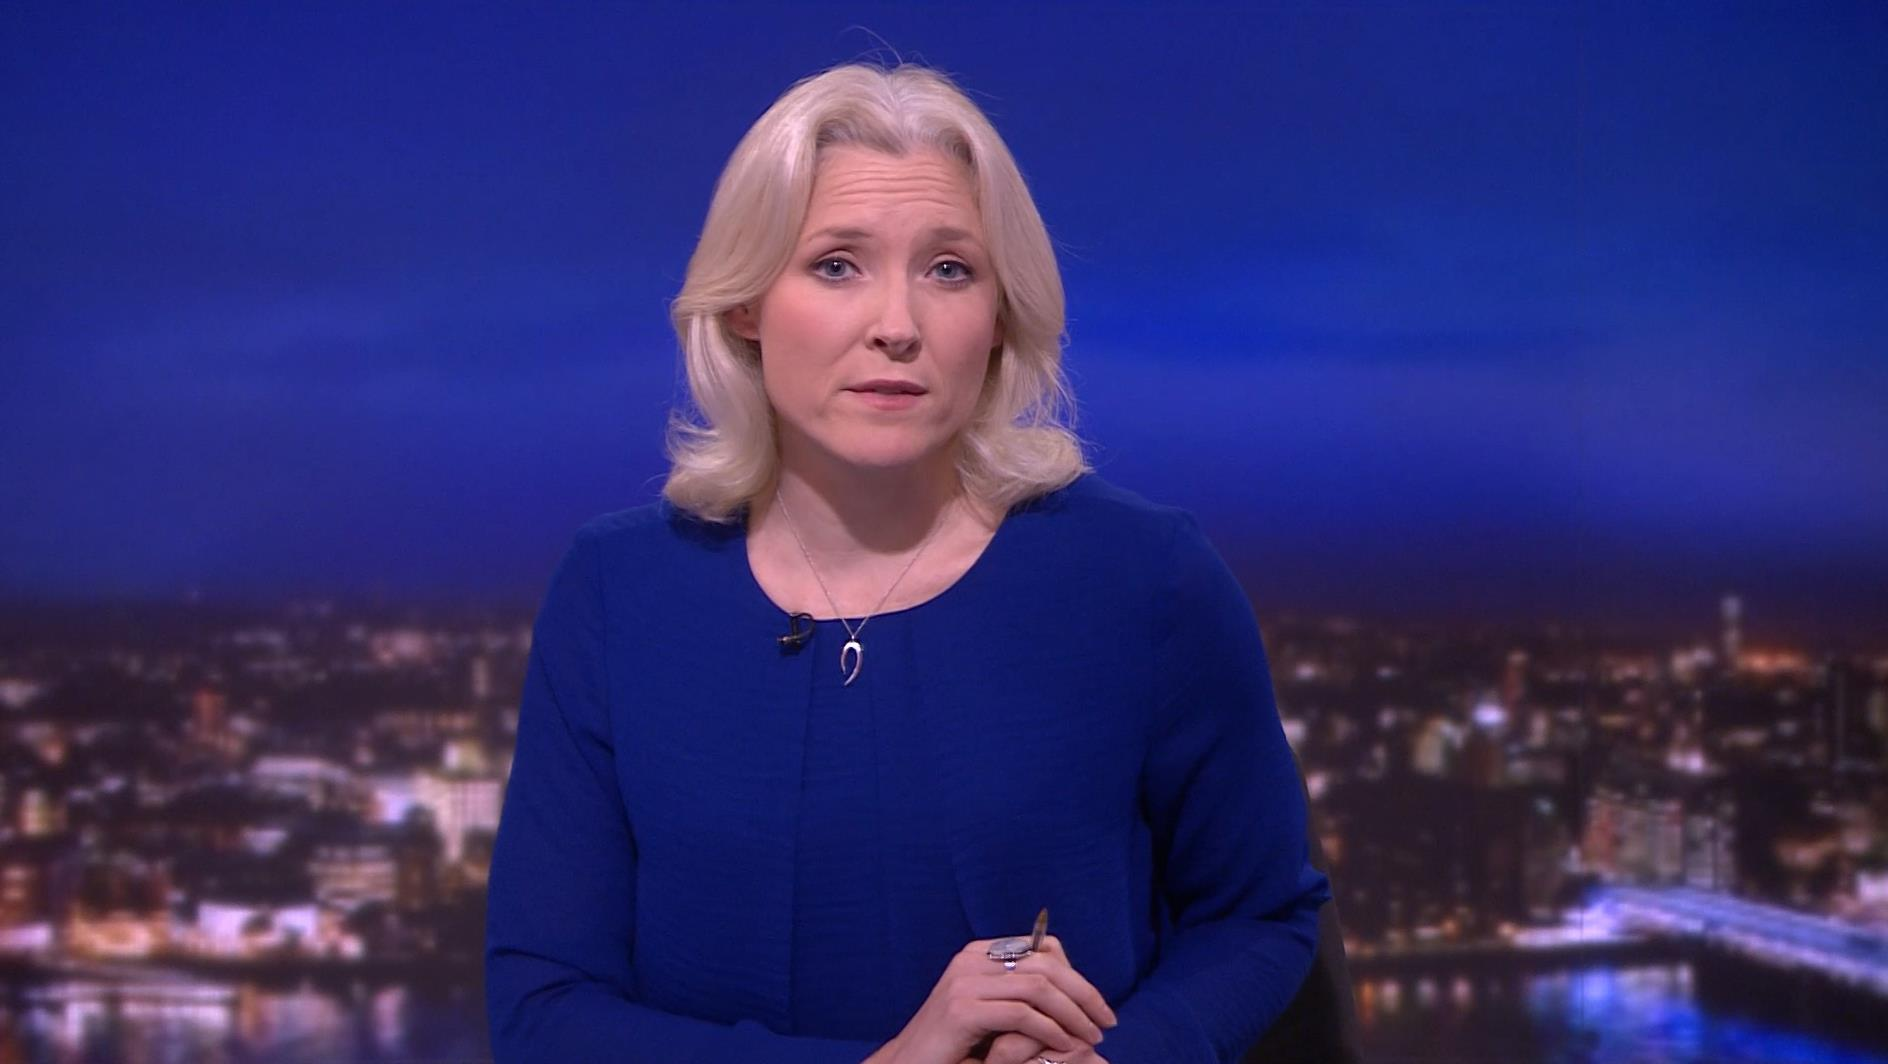 Lucy Grey - BBC News Presenter (1)